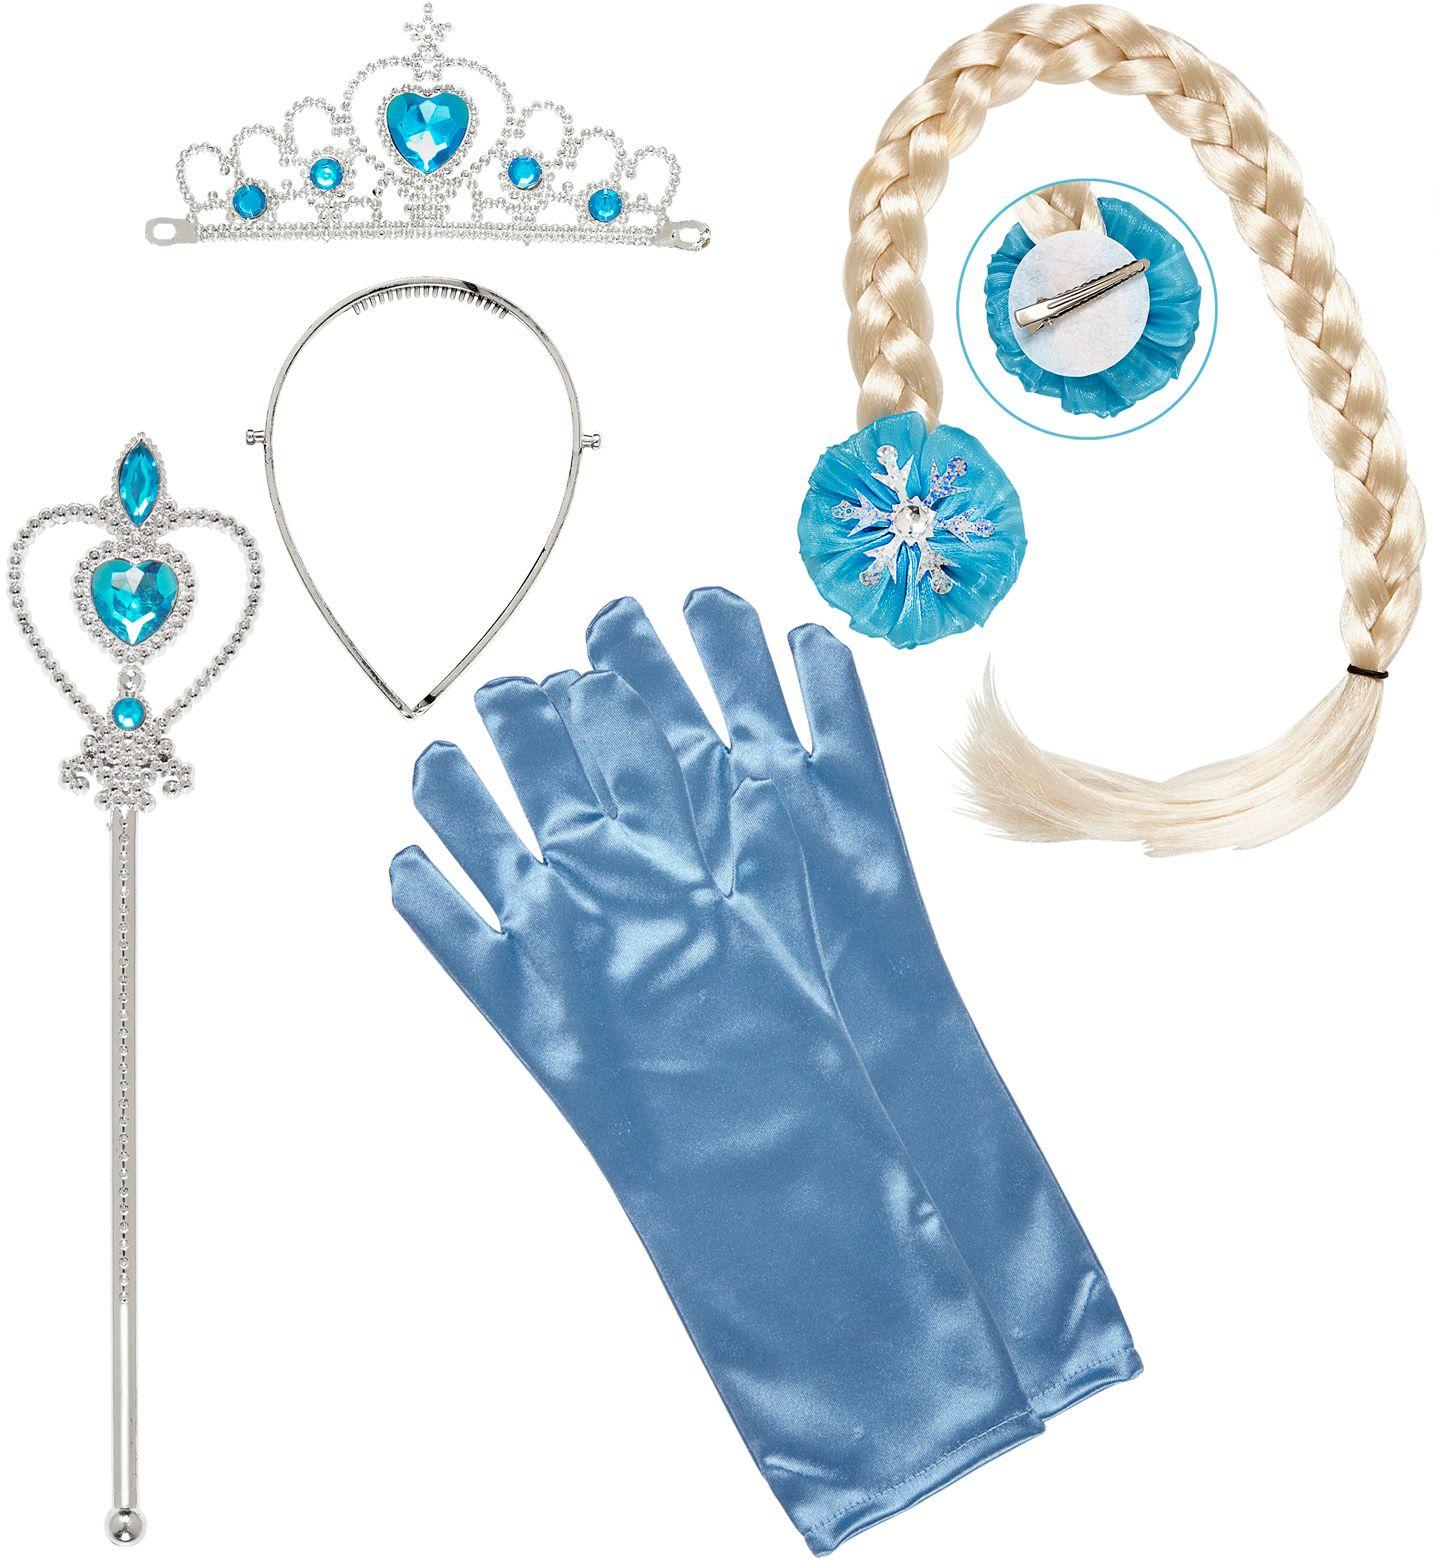 Blauwe sneeuwprinses sieraden set